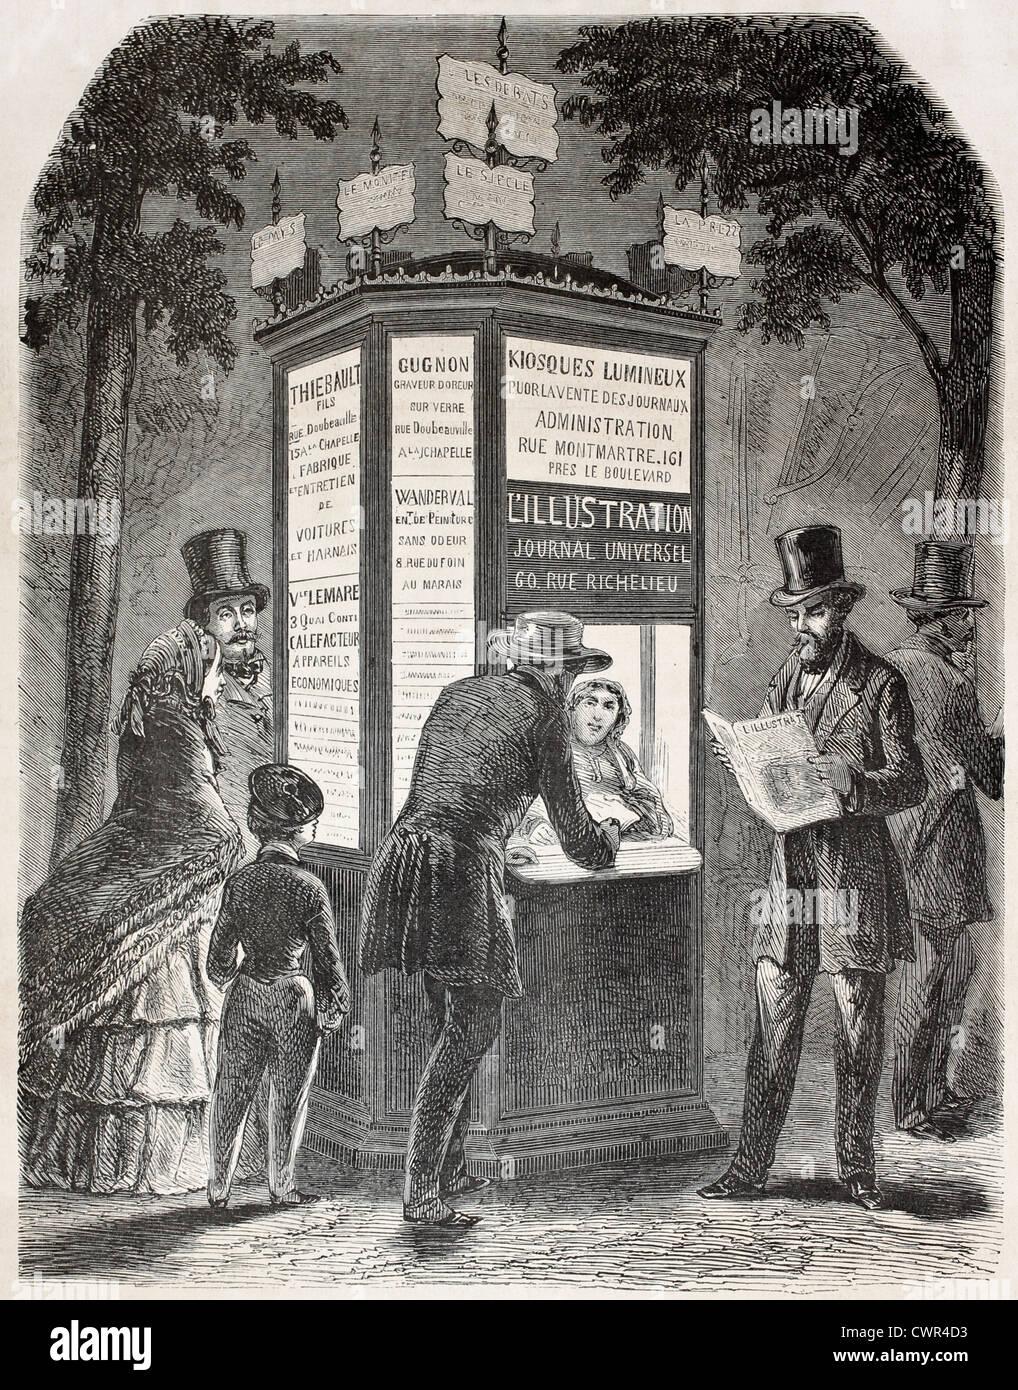 Old illustration of a newspaper kiosk - Stock Image